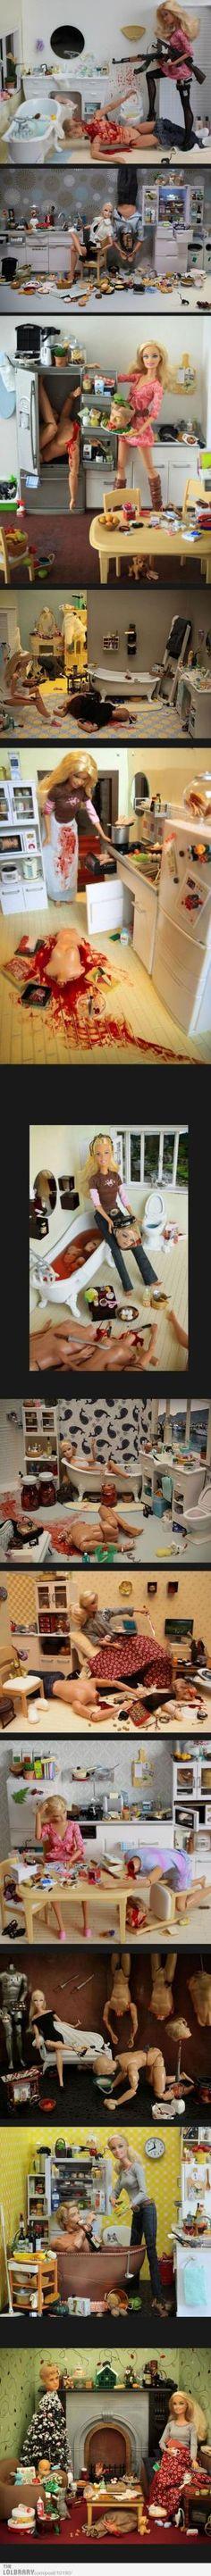 Barbie the Serial Killer by maryann